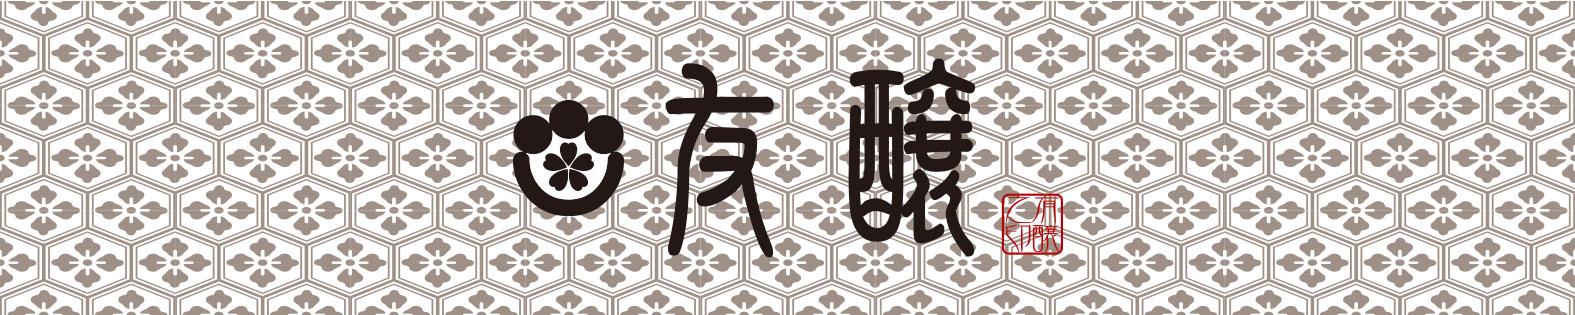 【日本酒】 秀鳳 夏吟醸 超辛口生原酒 向日葵サマー 出羽きらり50 限定 新酒25BY_e0173738_139559.jpg